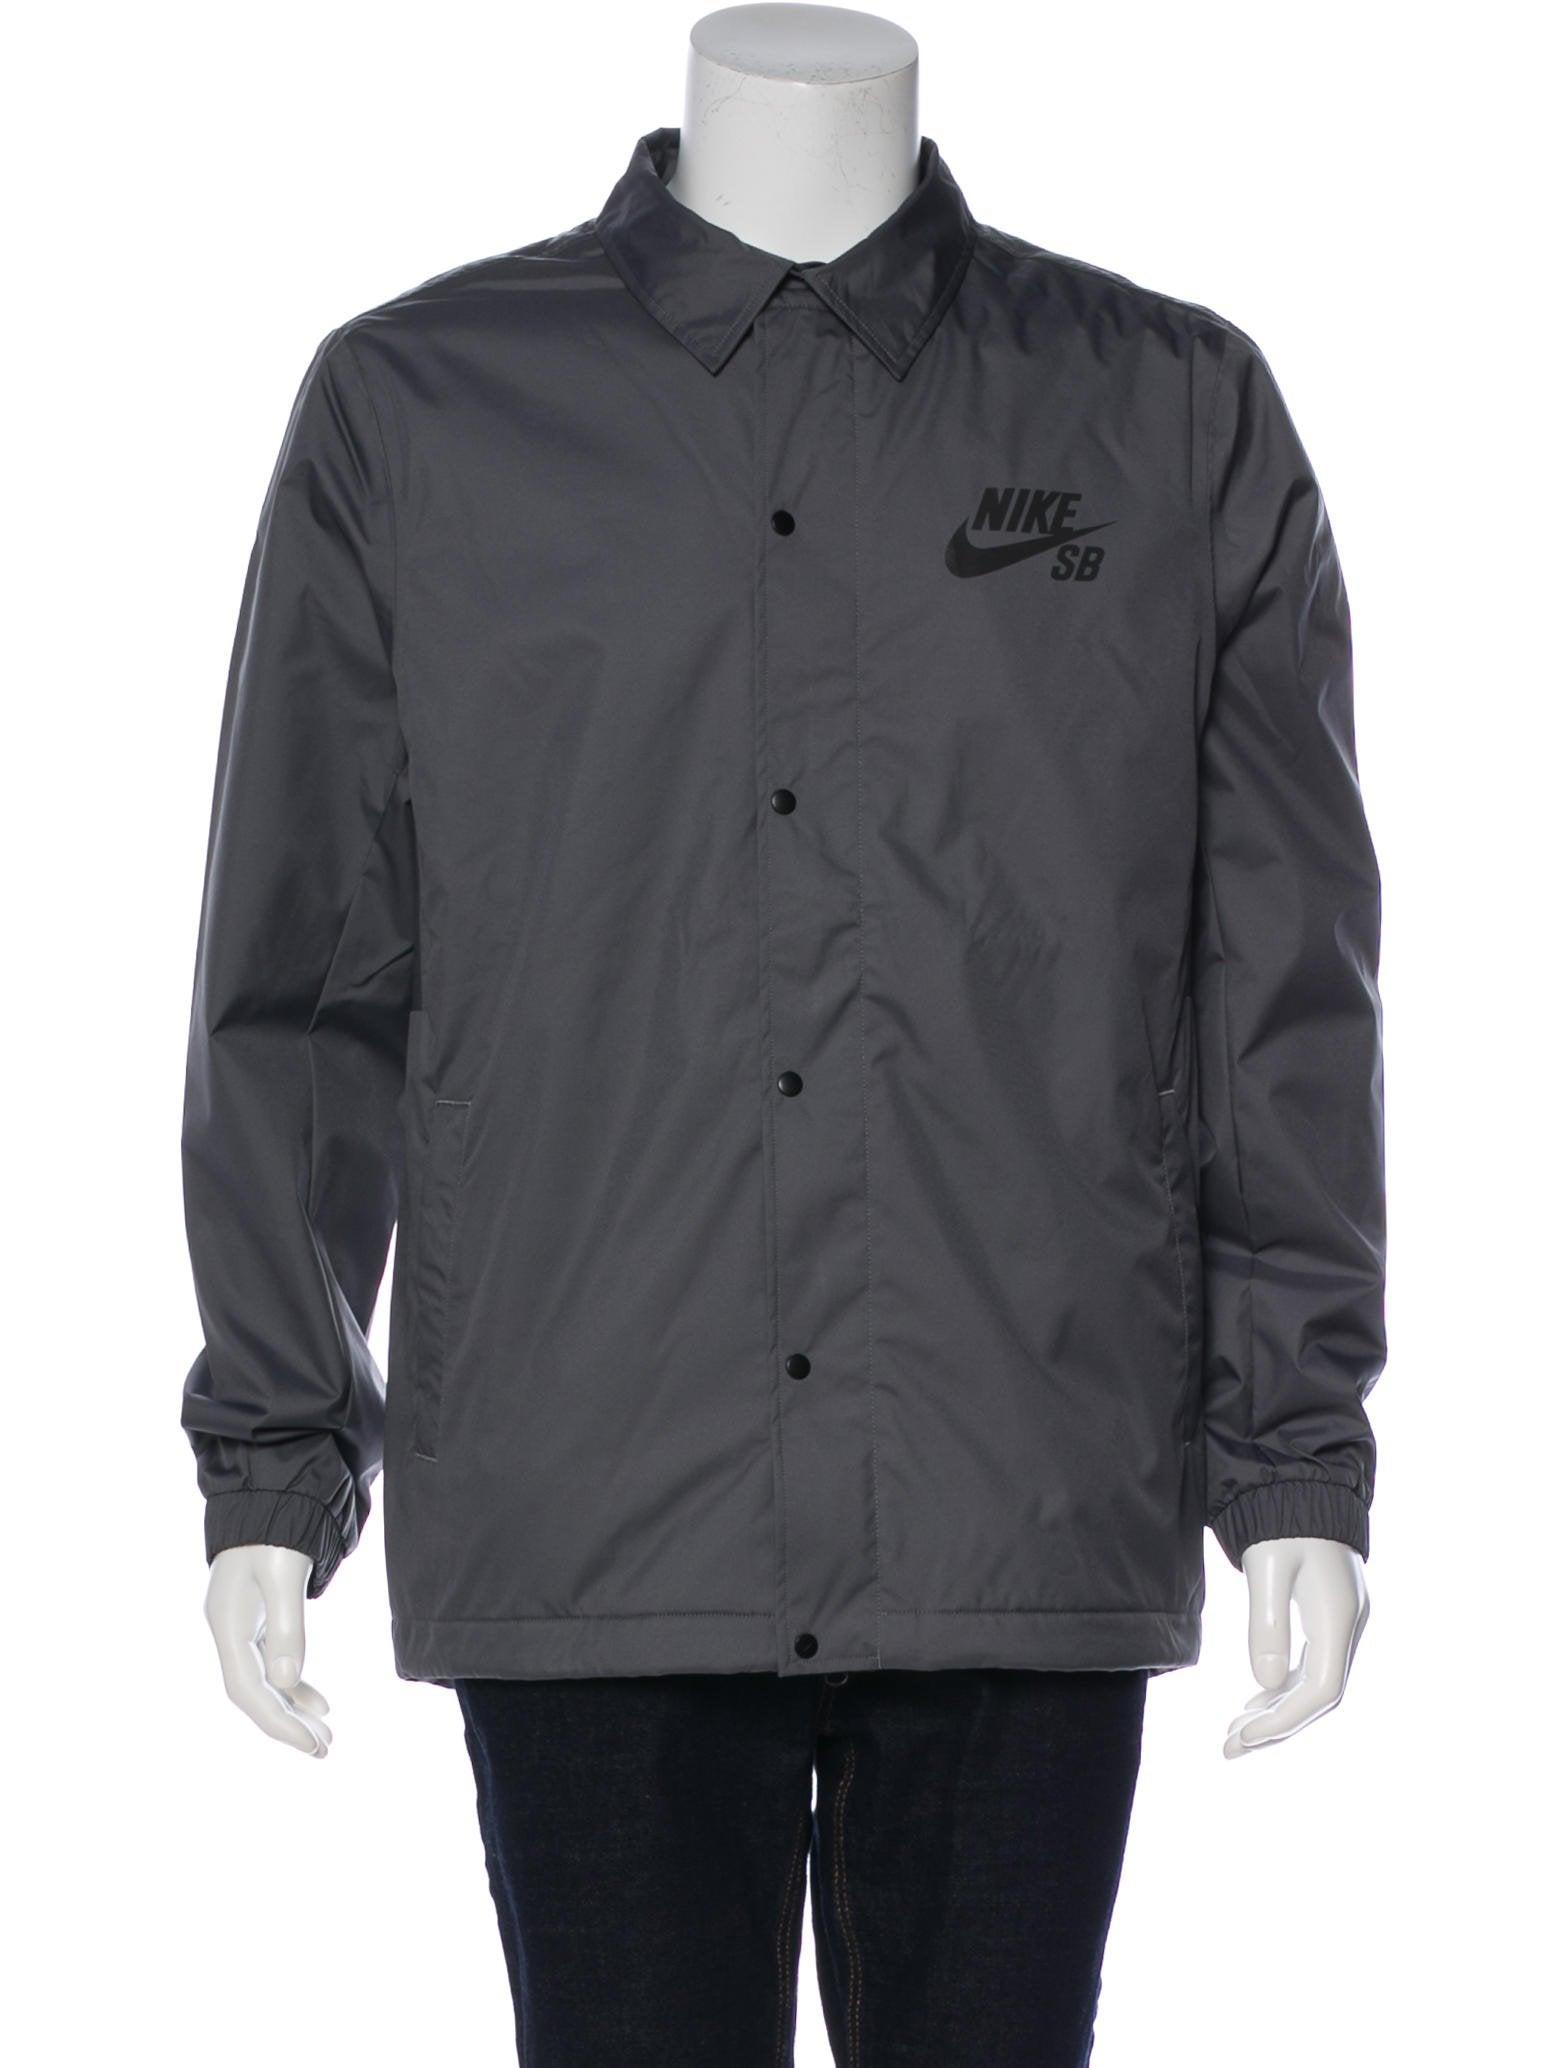 cc1b69f2fbce Nike SB Shield Coaches Jacket w  Tags - Clothing - WU229708